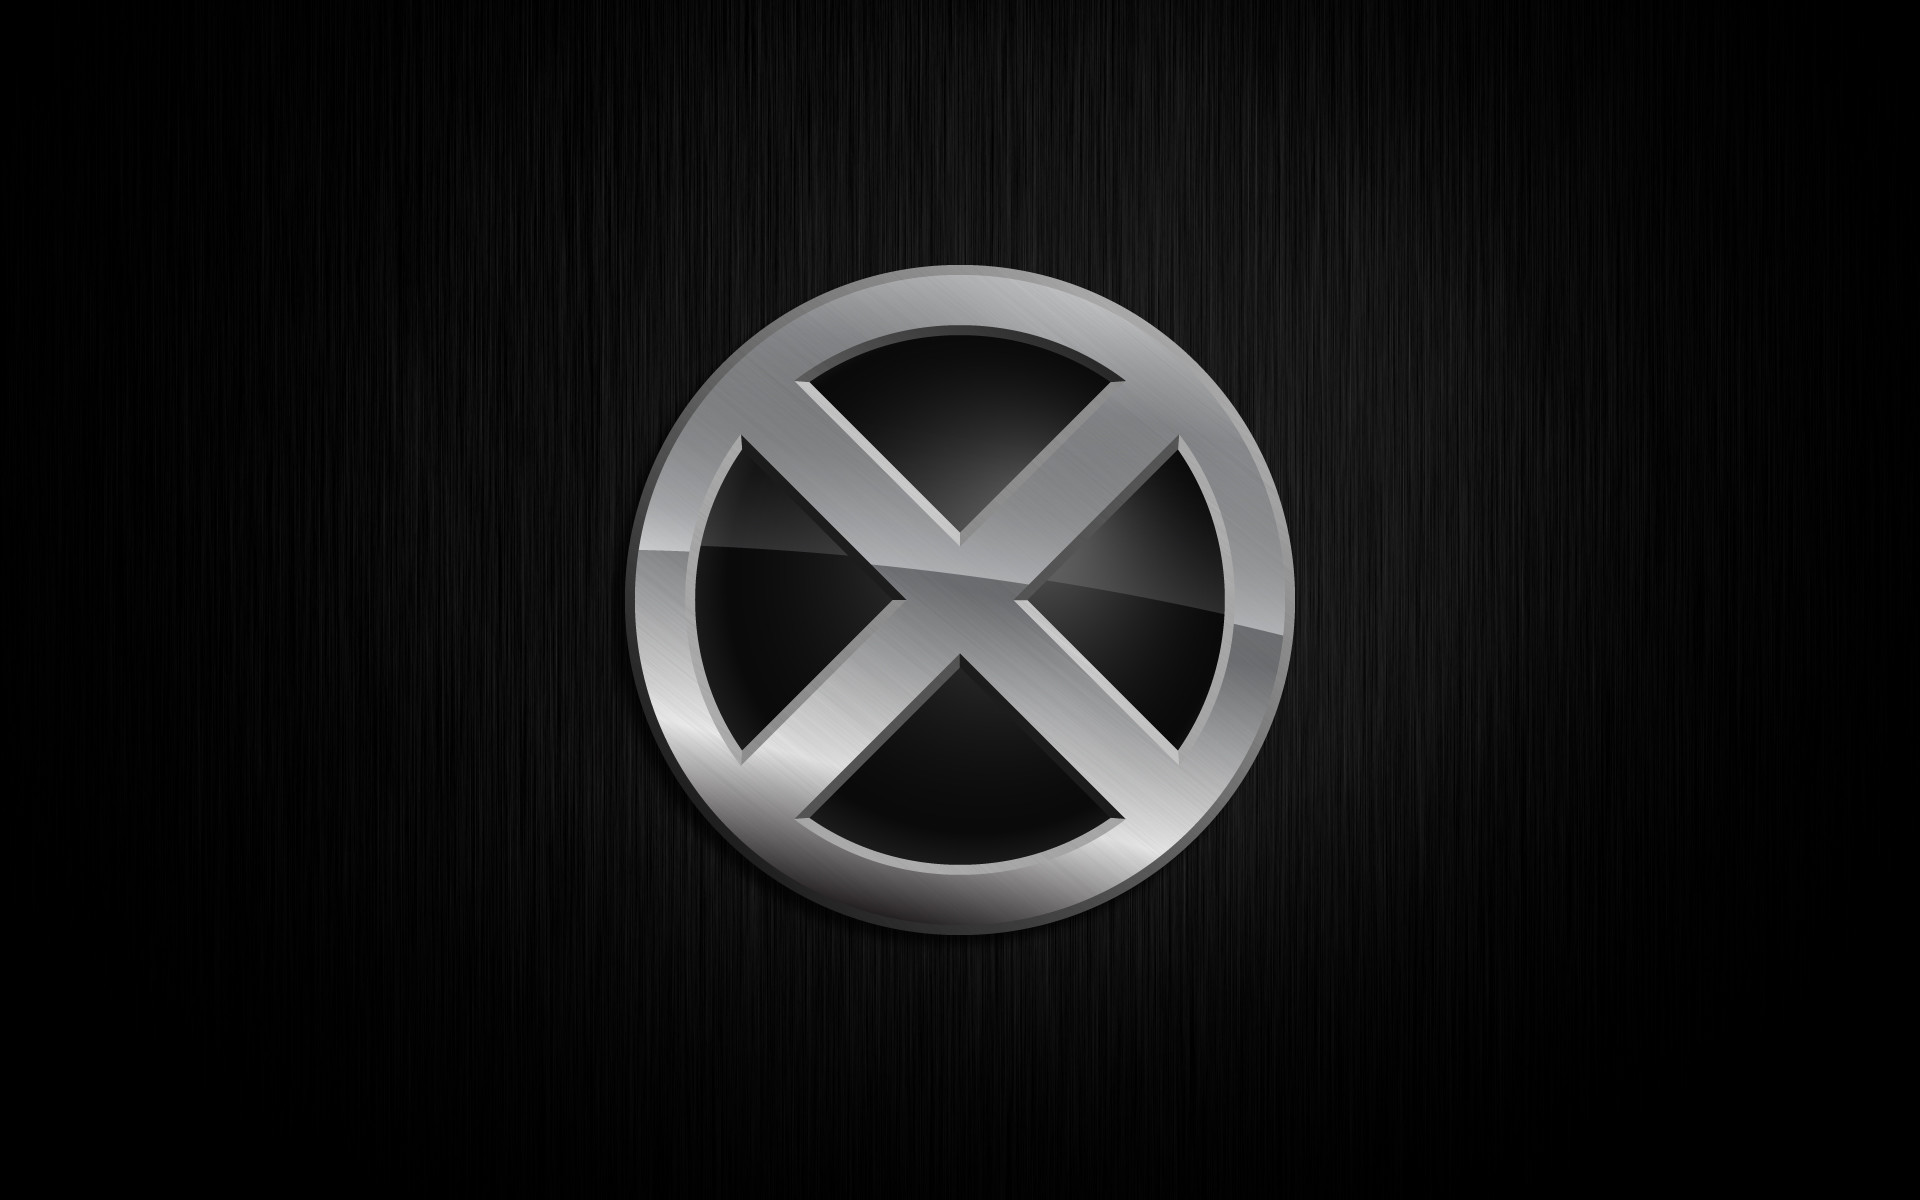 Men Logos Wallpaper XMen, Logos